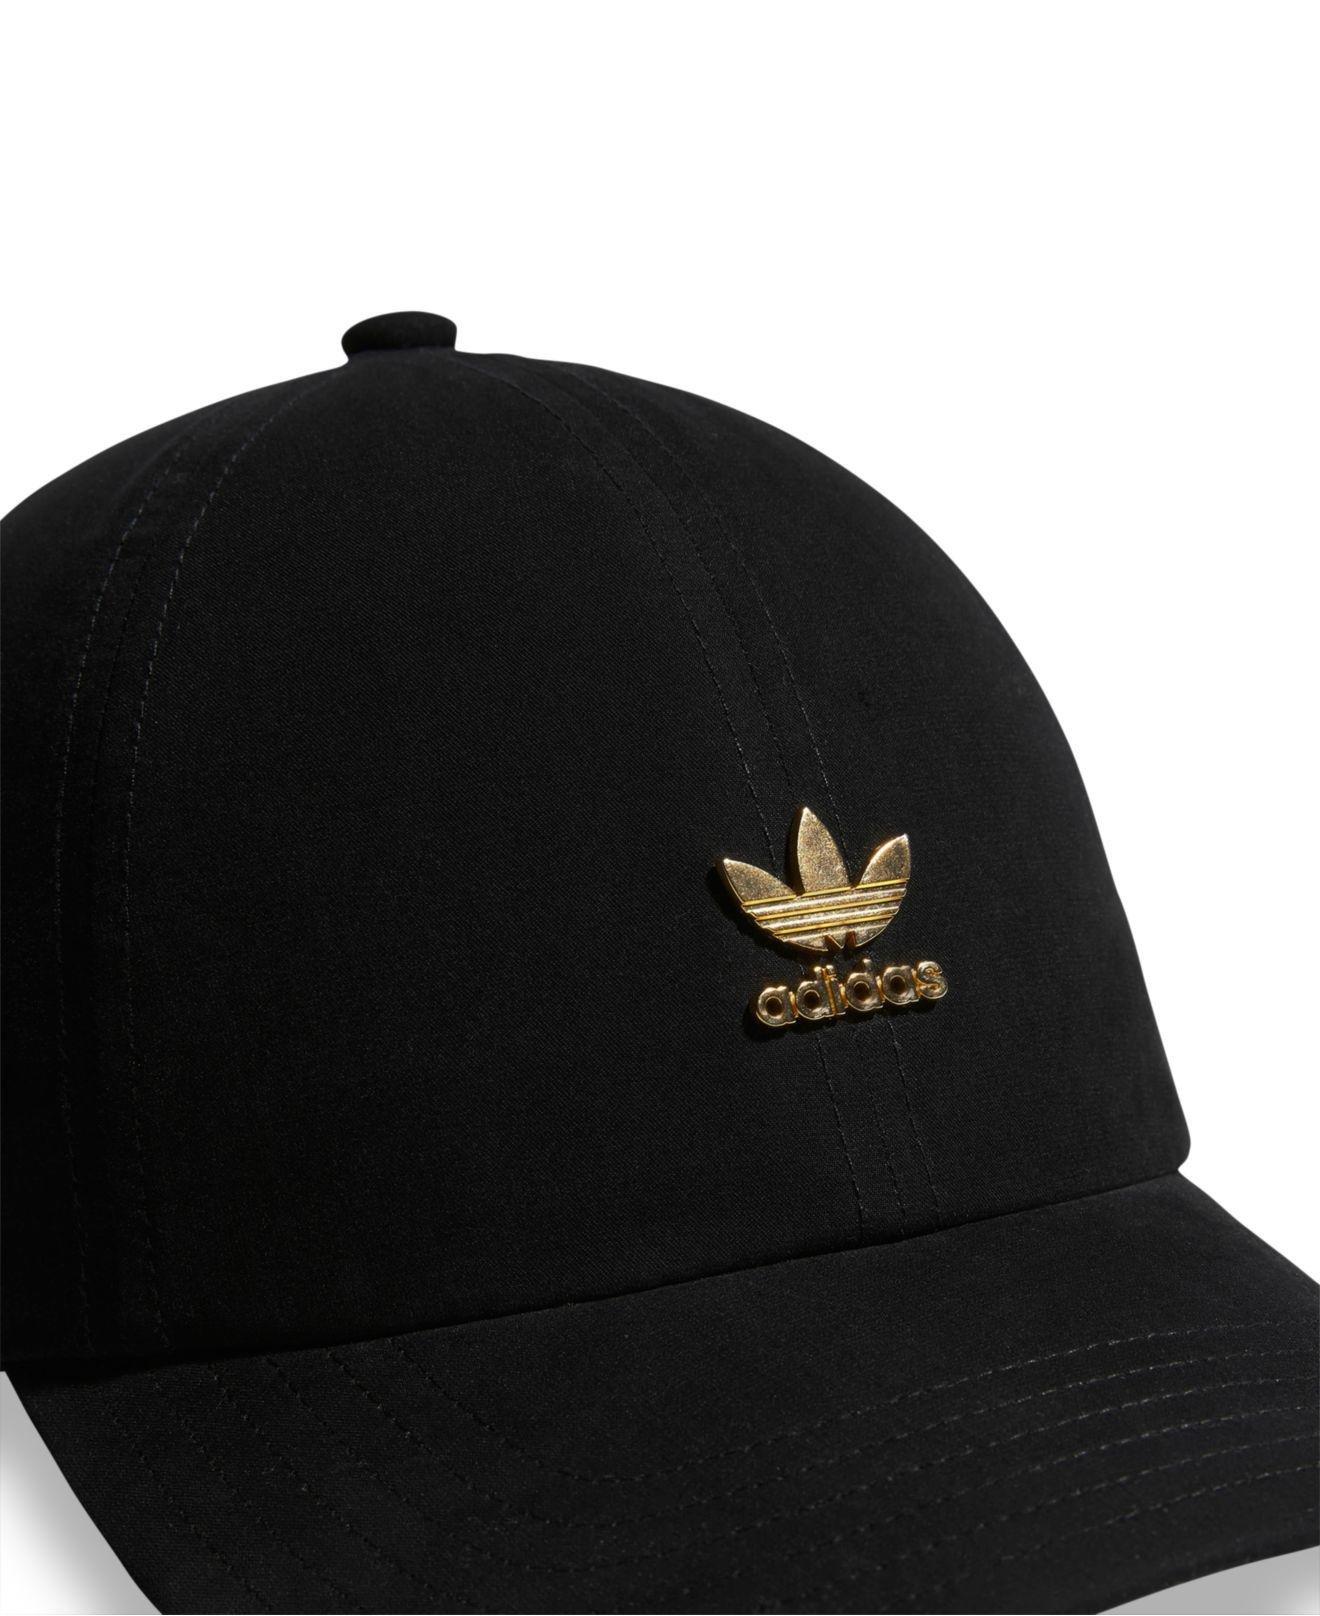 Lyst - adidas Originals Metallic-logo Relaxed Cap in Black 58950be0e42